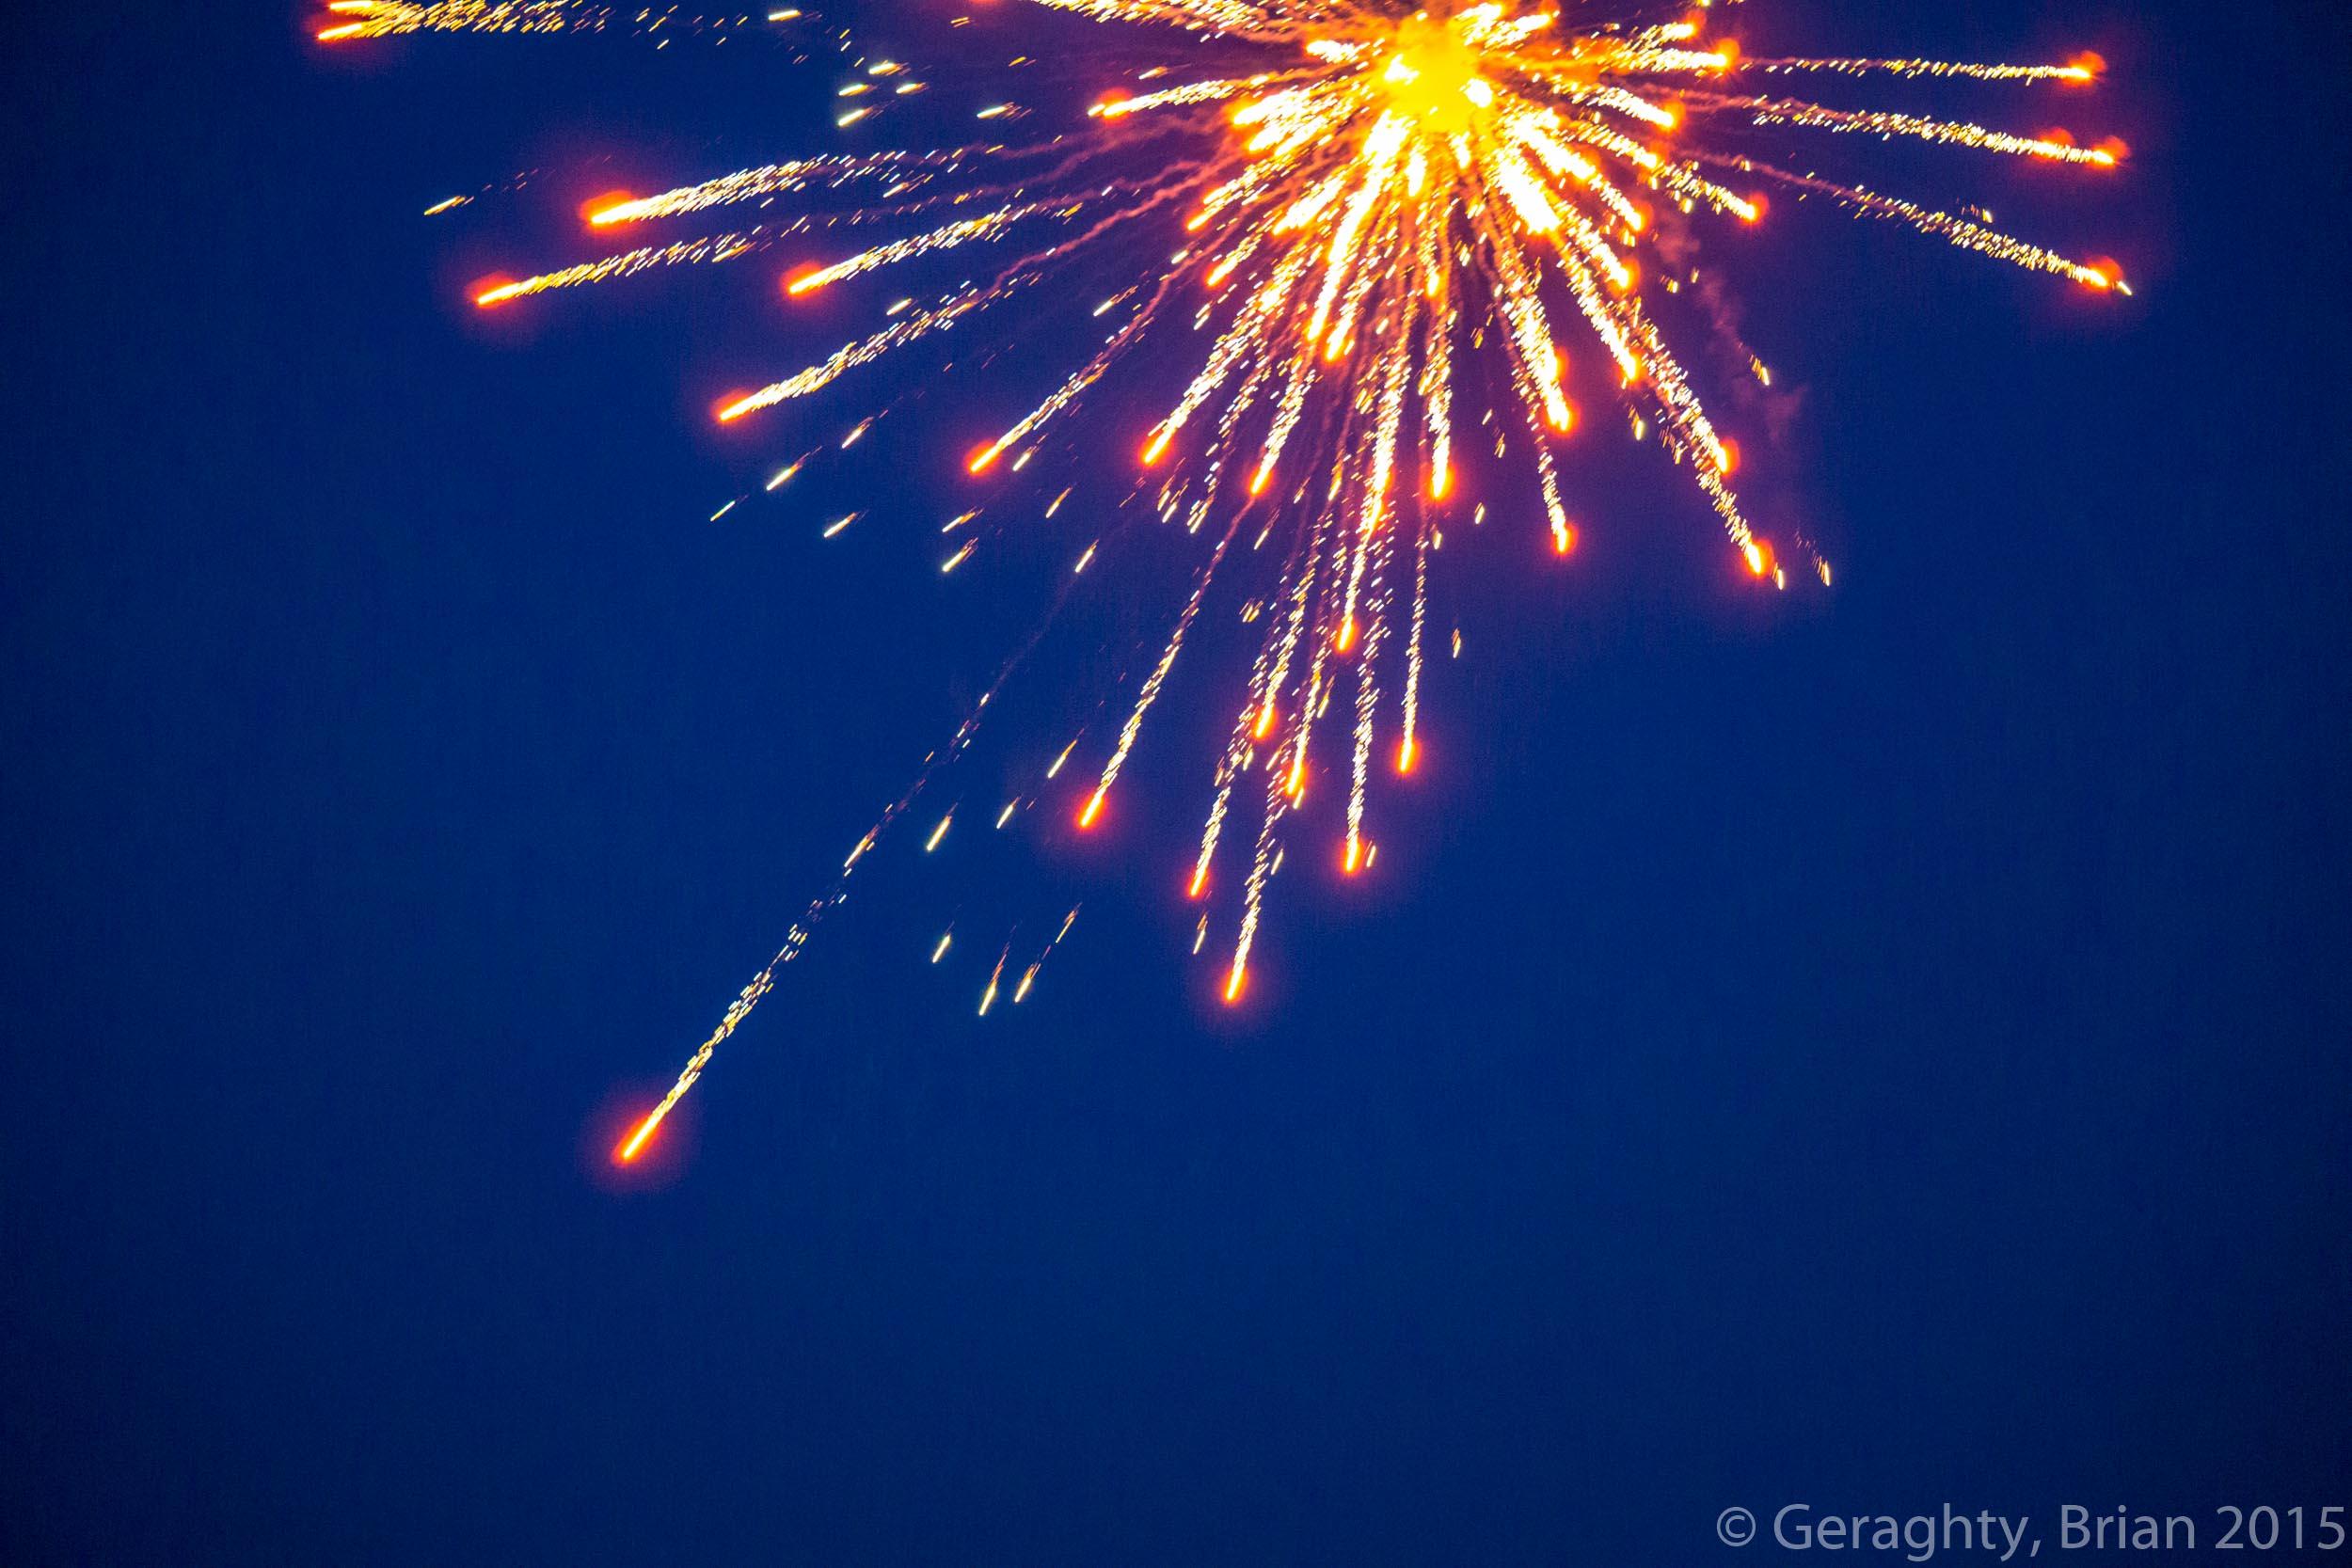 Beach Fireworks Explosion, Explosion, Fireworks, Lights, OBX, HQ Photo